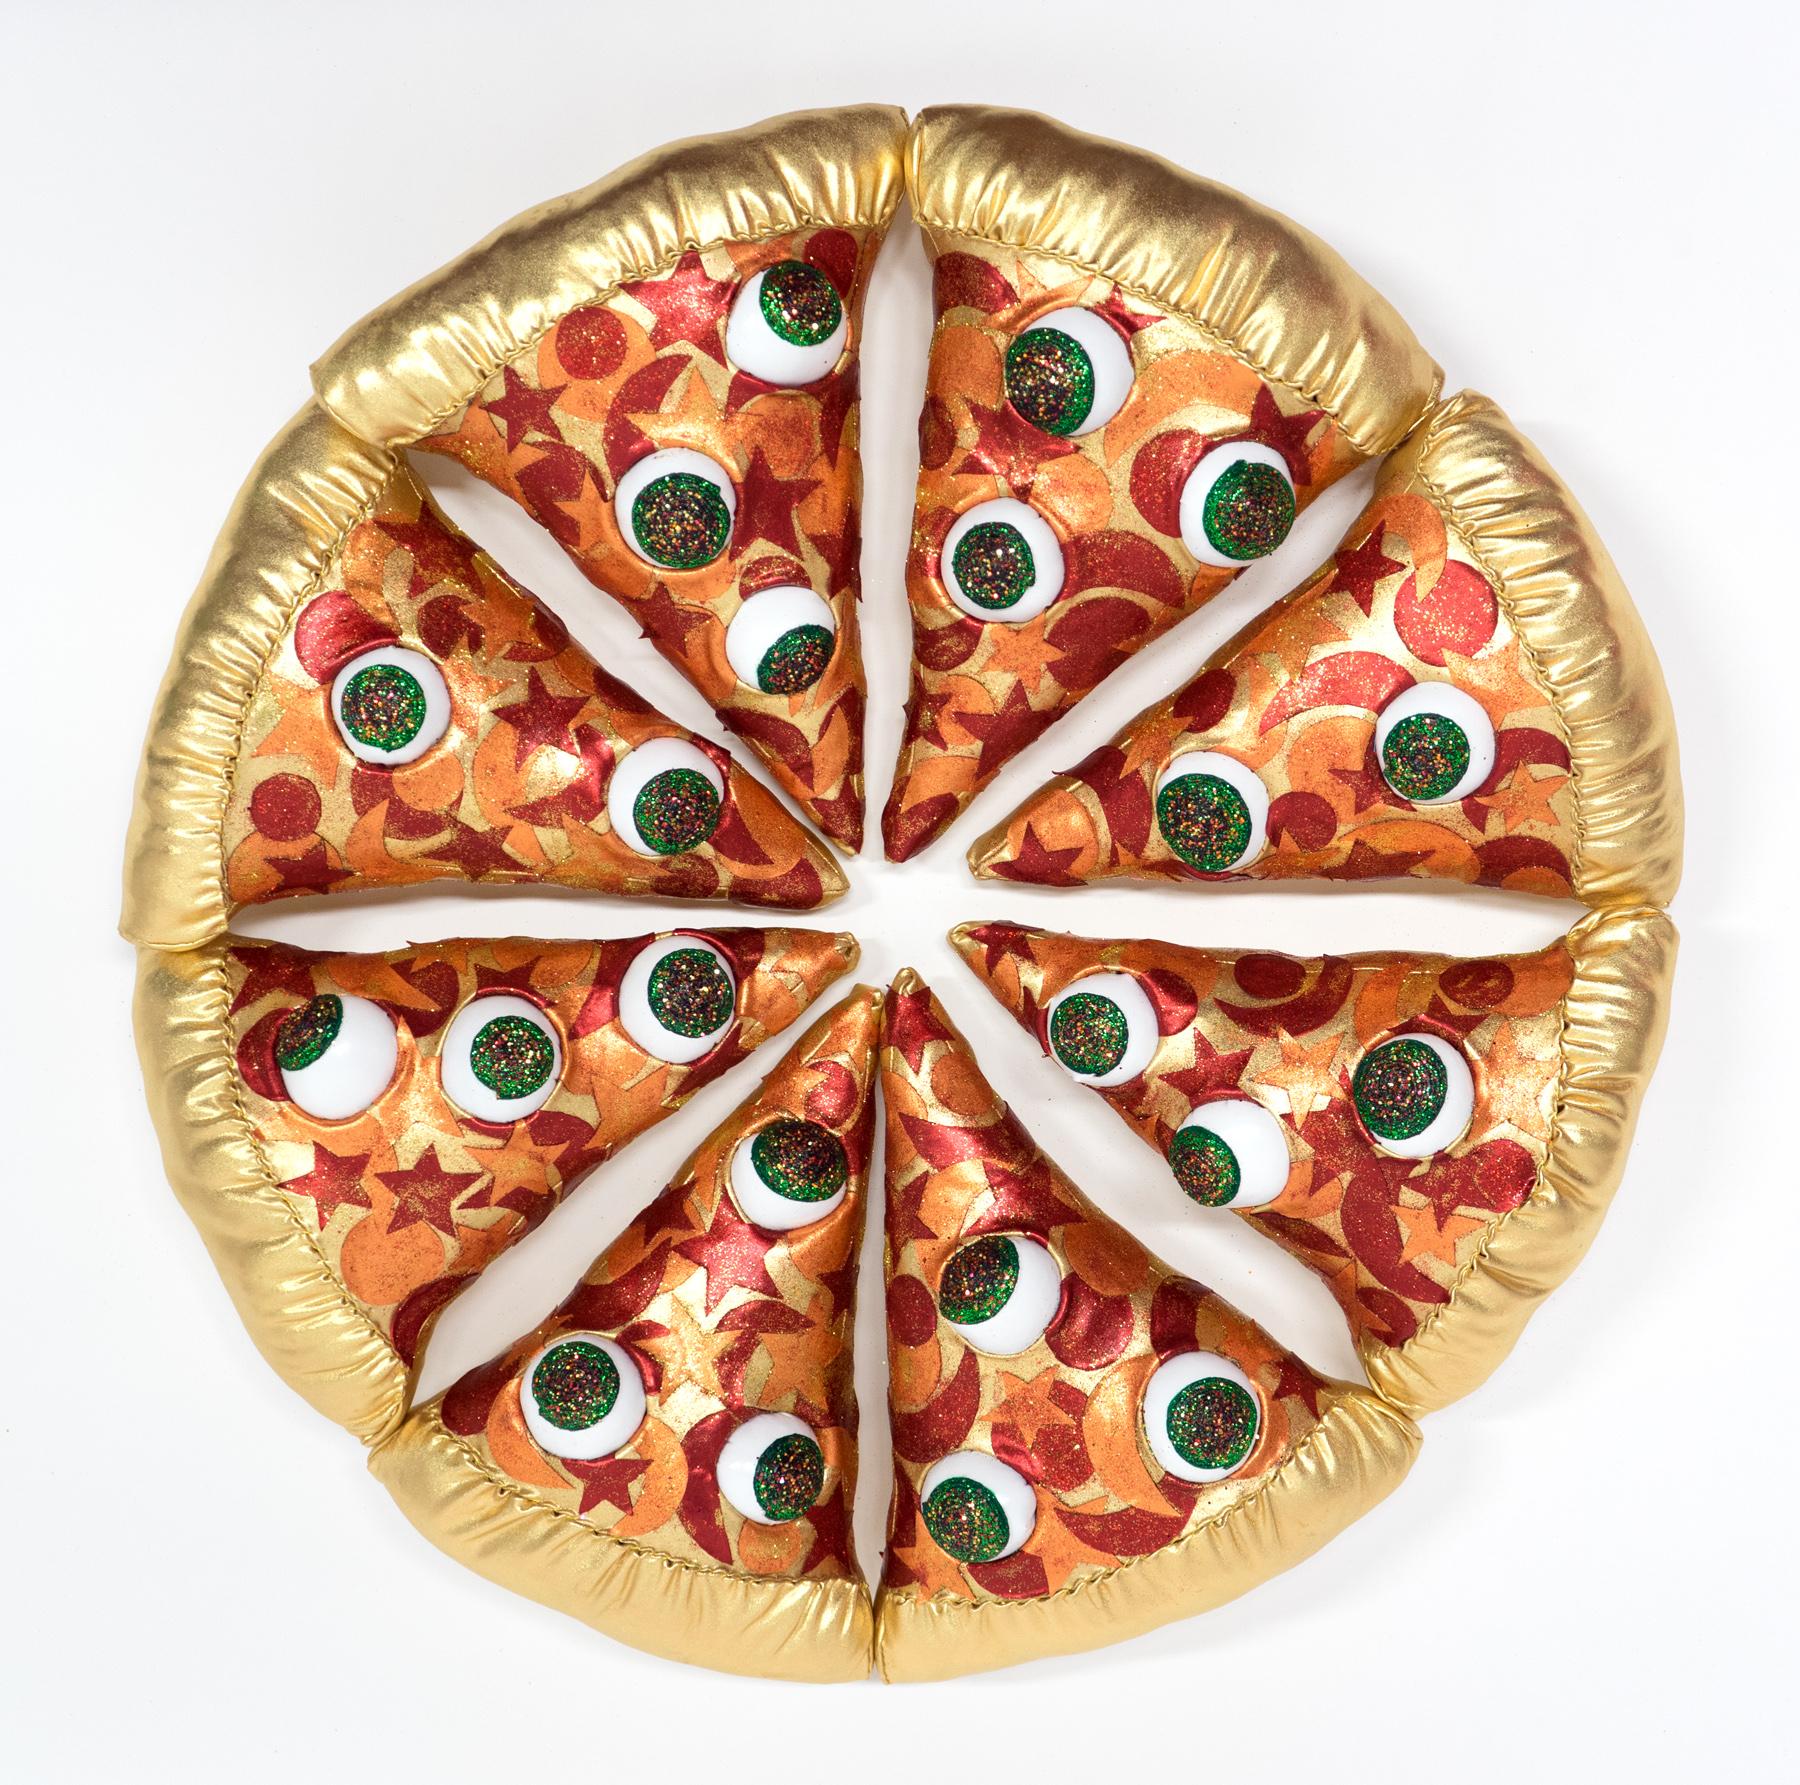 Hein Koh - Mystic Pizza